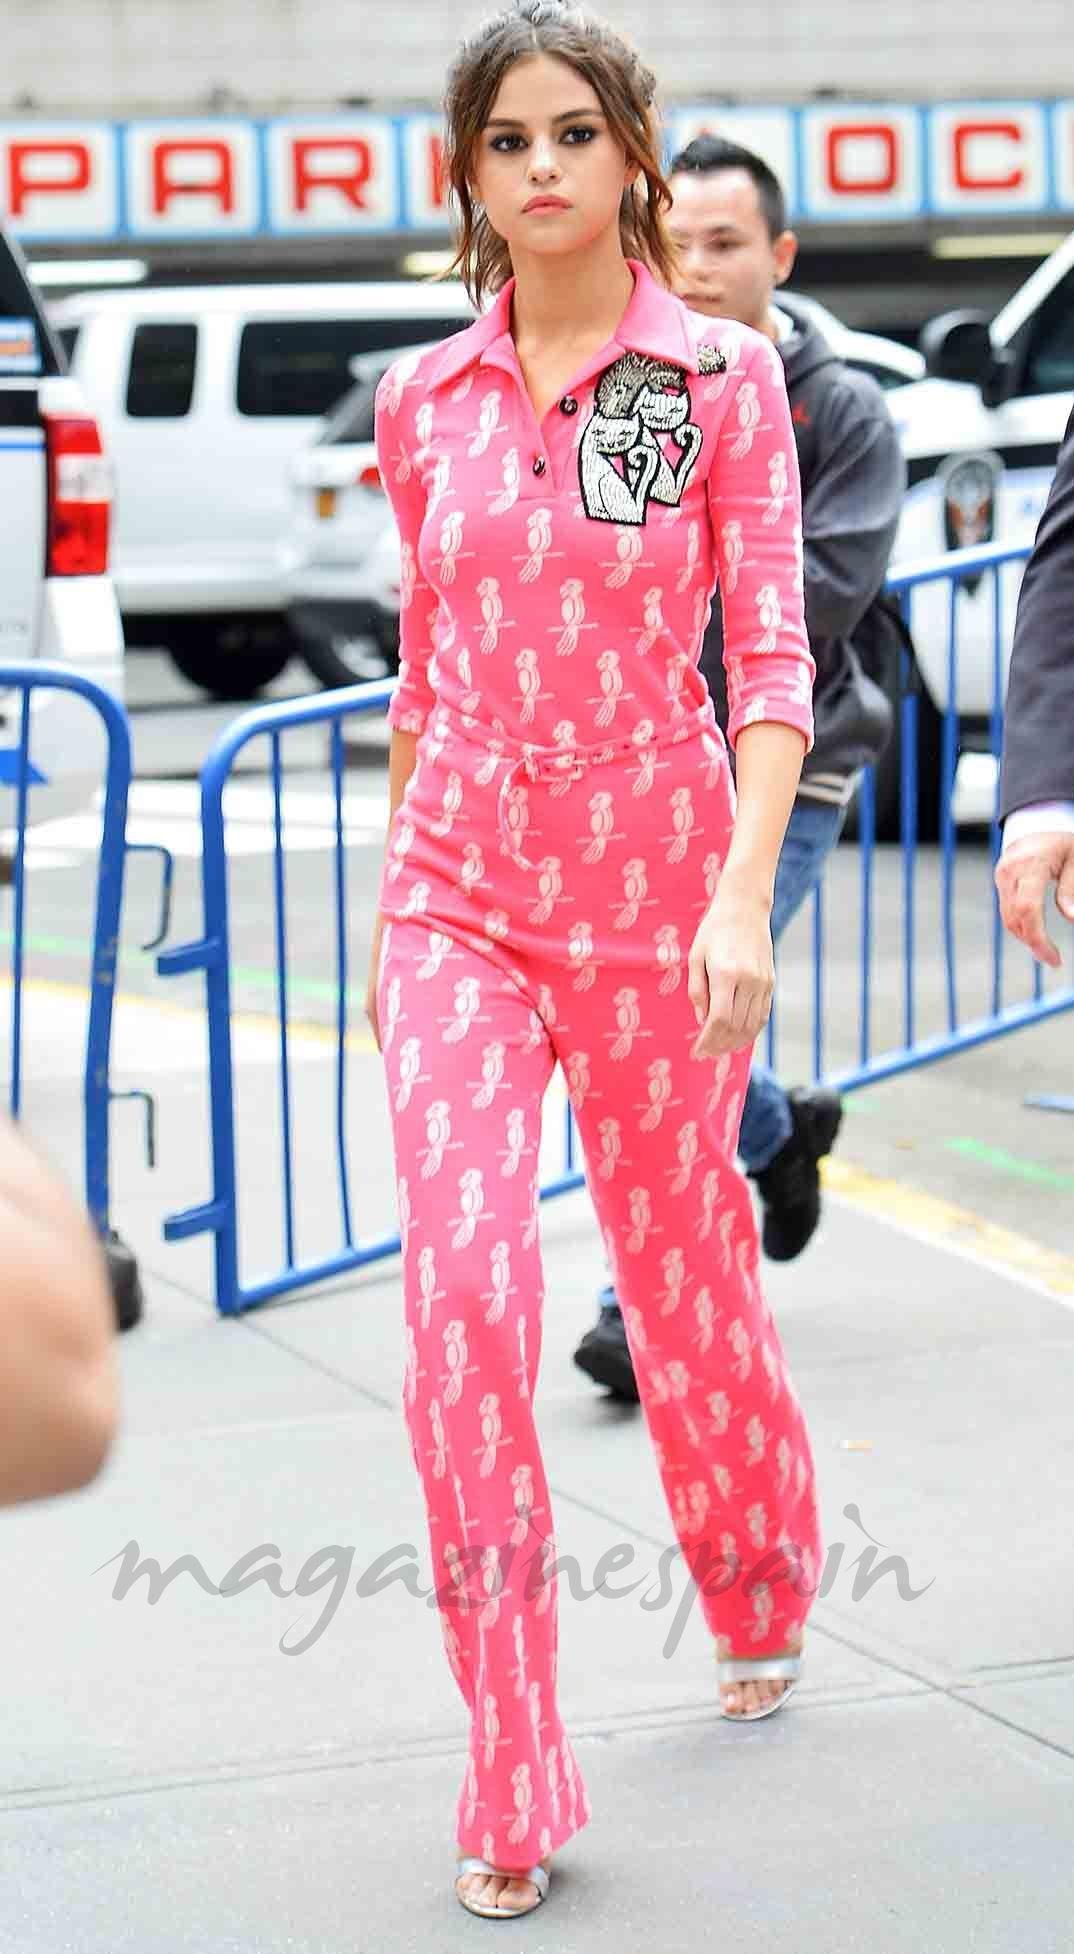 c3f8def72 Selena Gómez se apunta a la moda del pijama   Selena Gomez   Selena ...